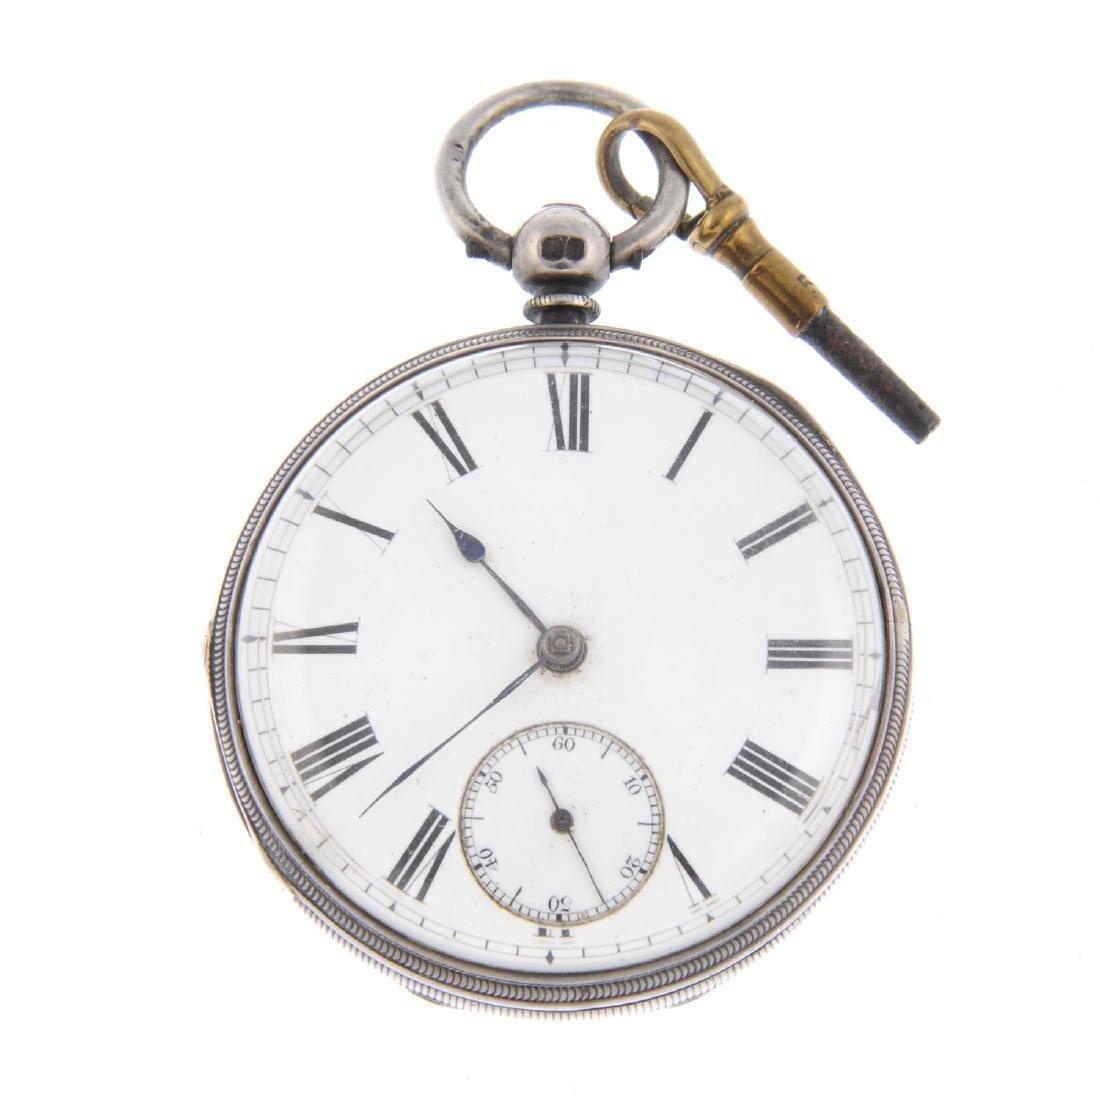 An open face pocket watch. Silver case, hallmarked